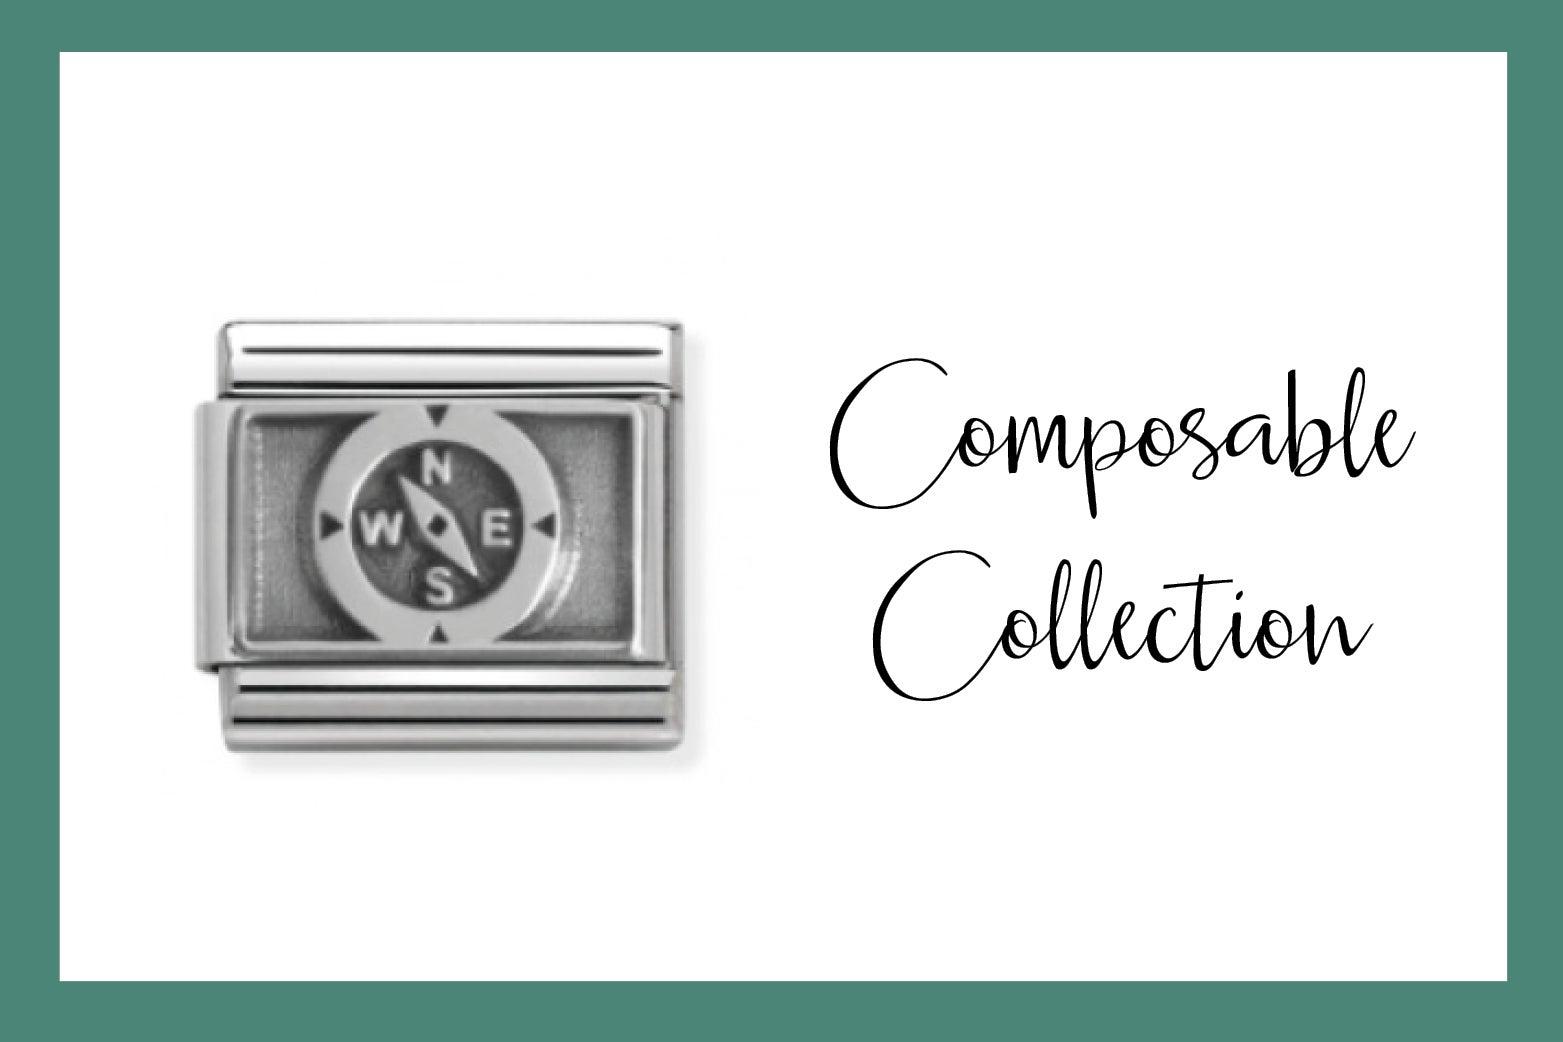 Composable Classic Link mit Symbol Kompass